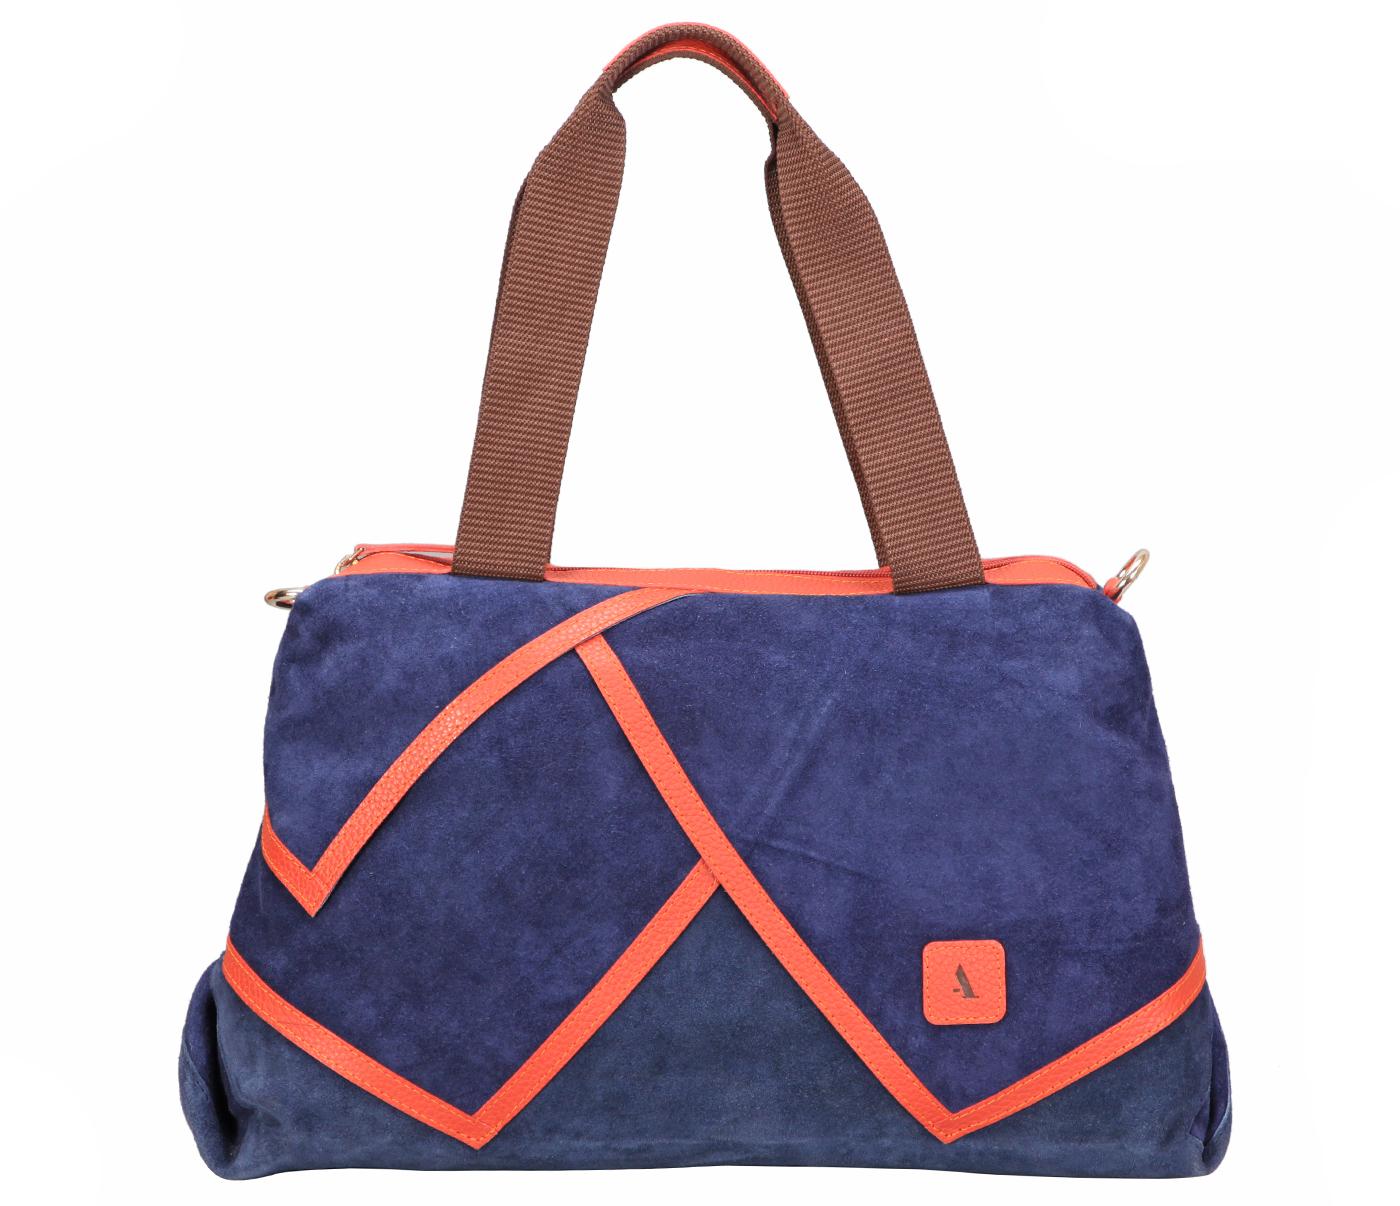 Handbag - B862